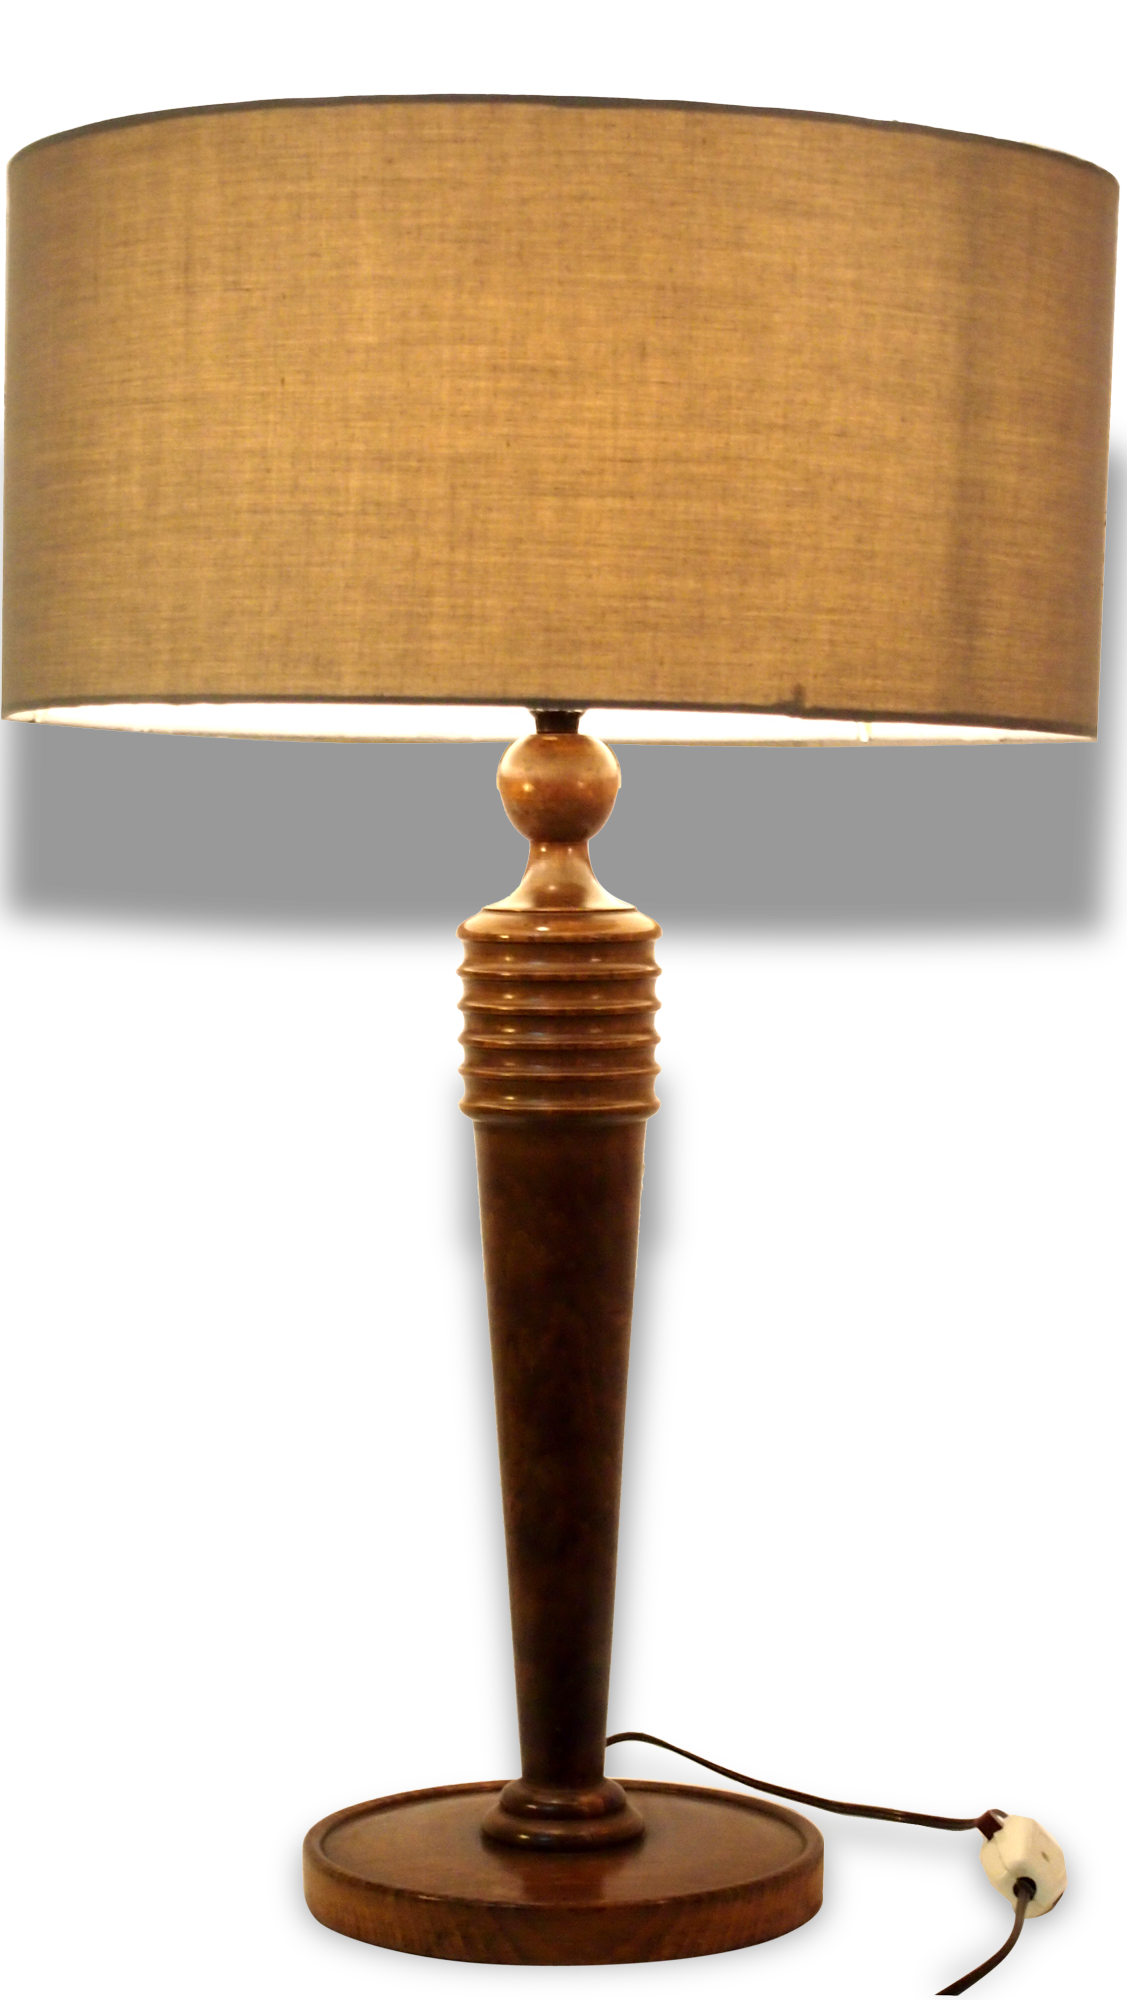 Lampe table bureau acajou art deco mid century moderniste bois